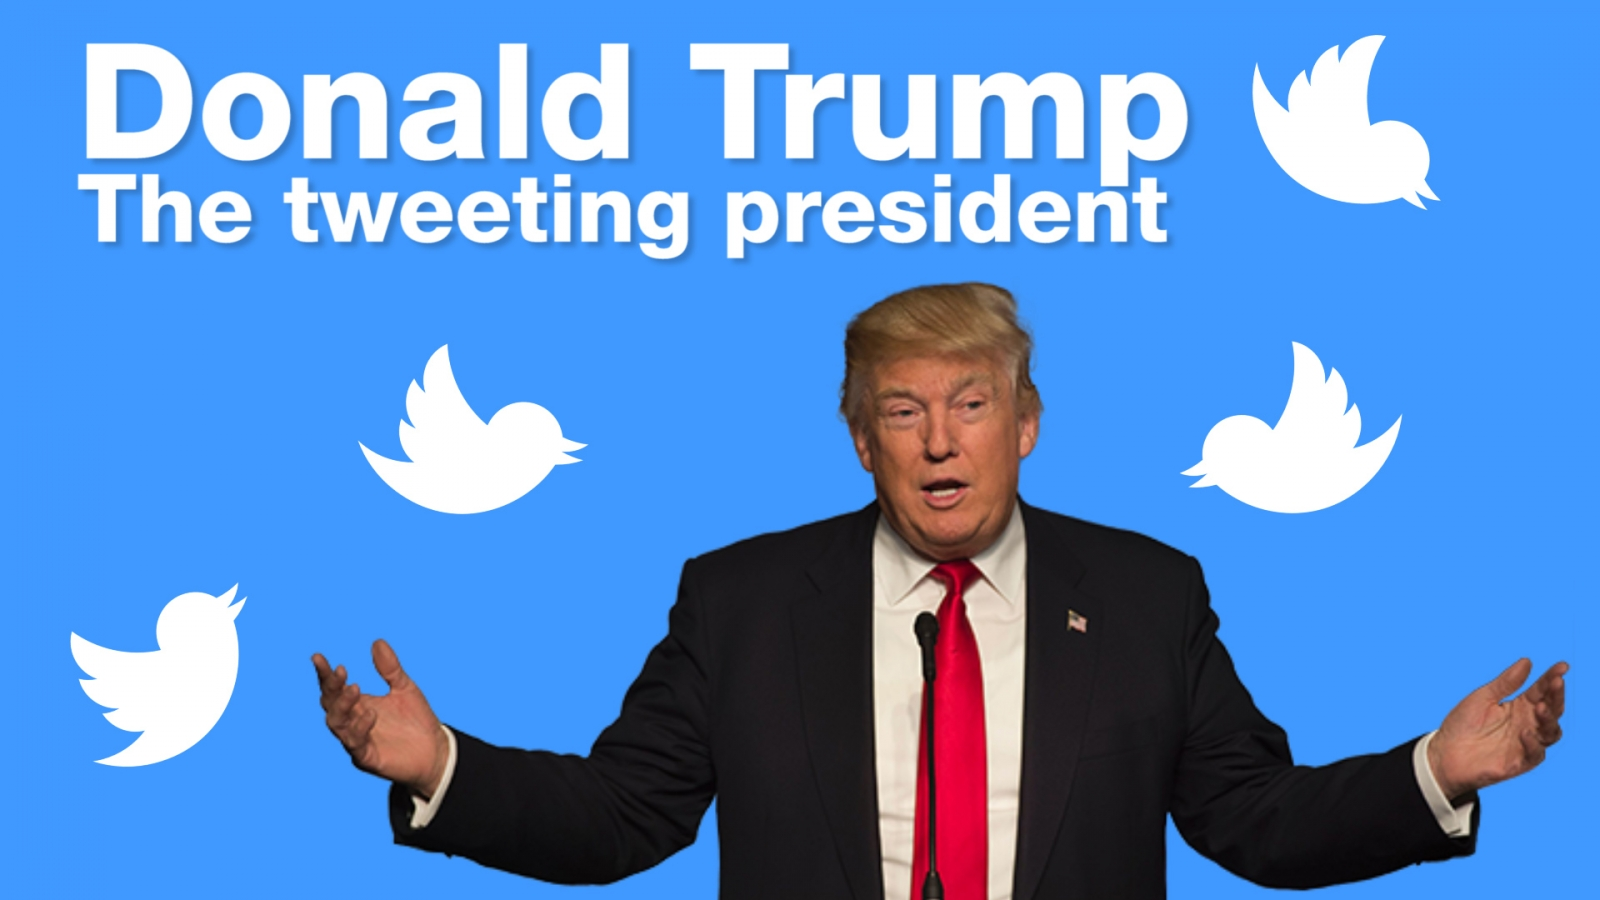 Donald Trump: The Twitter president